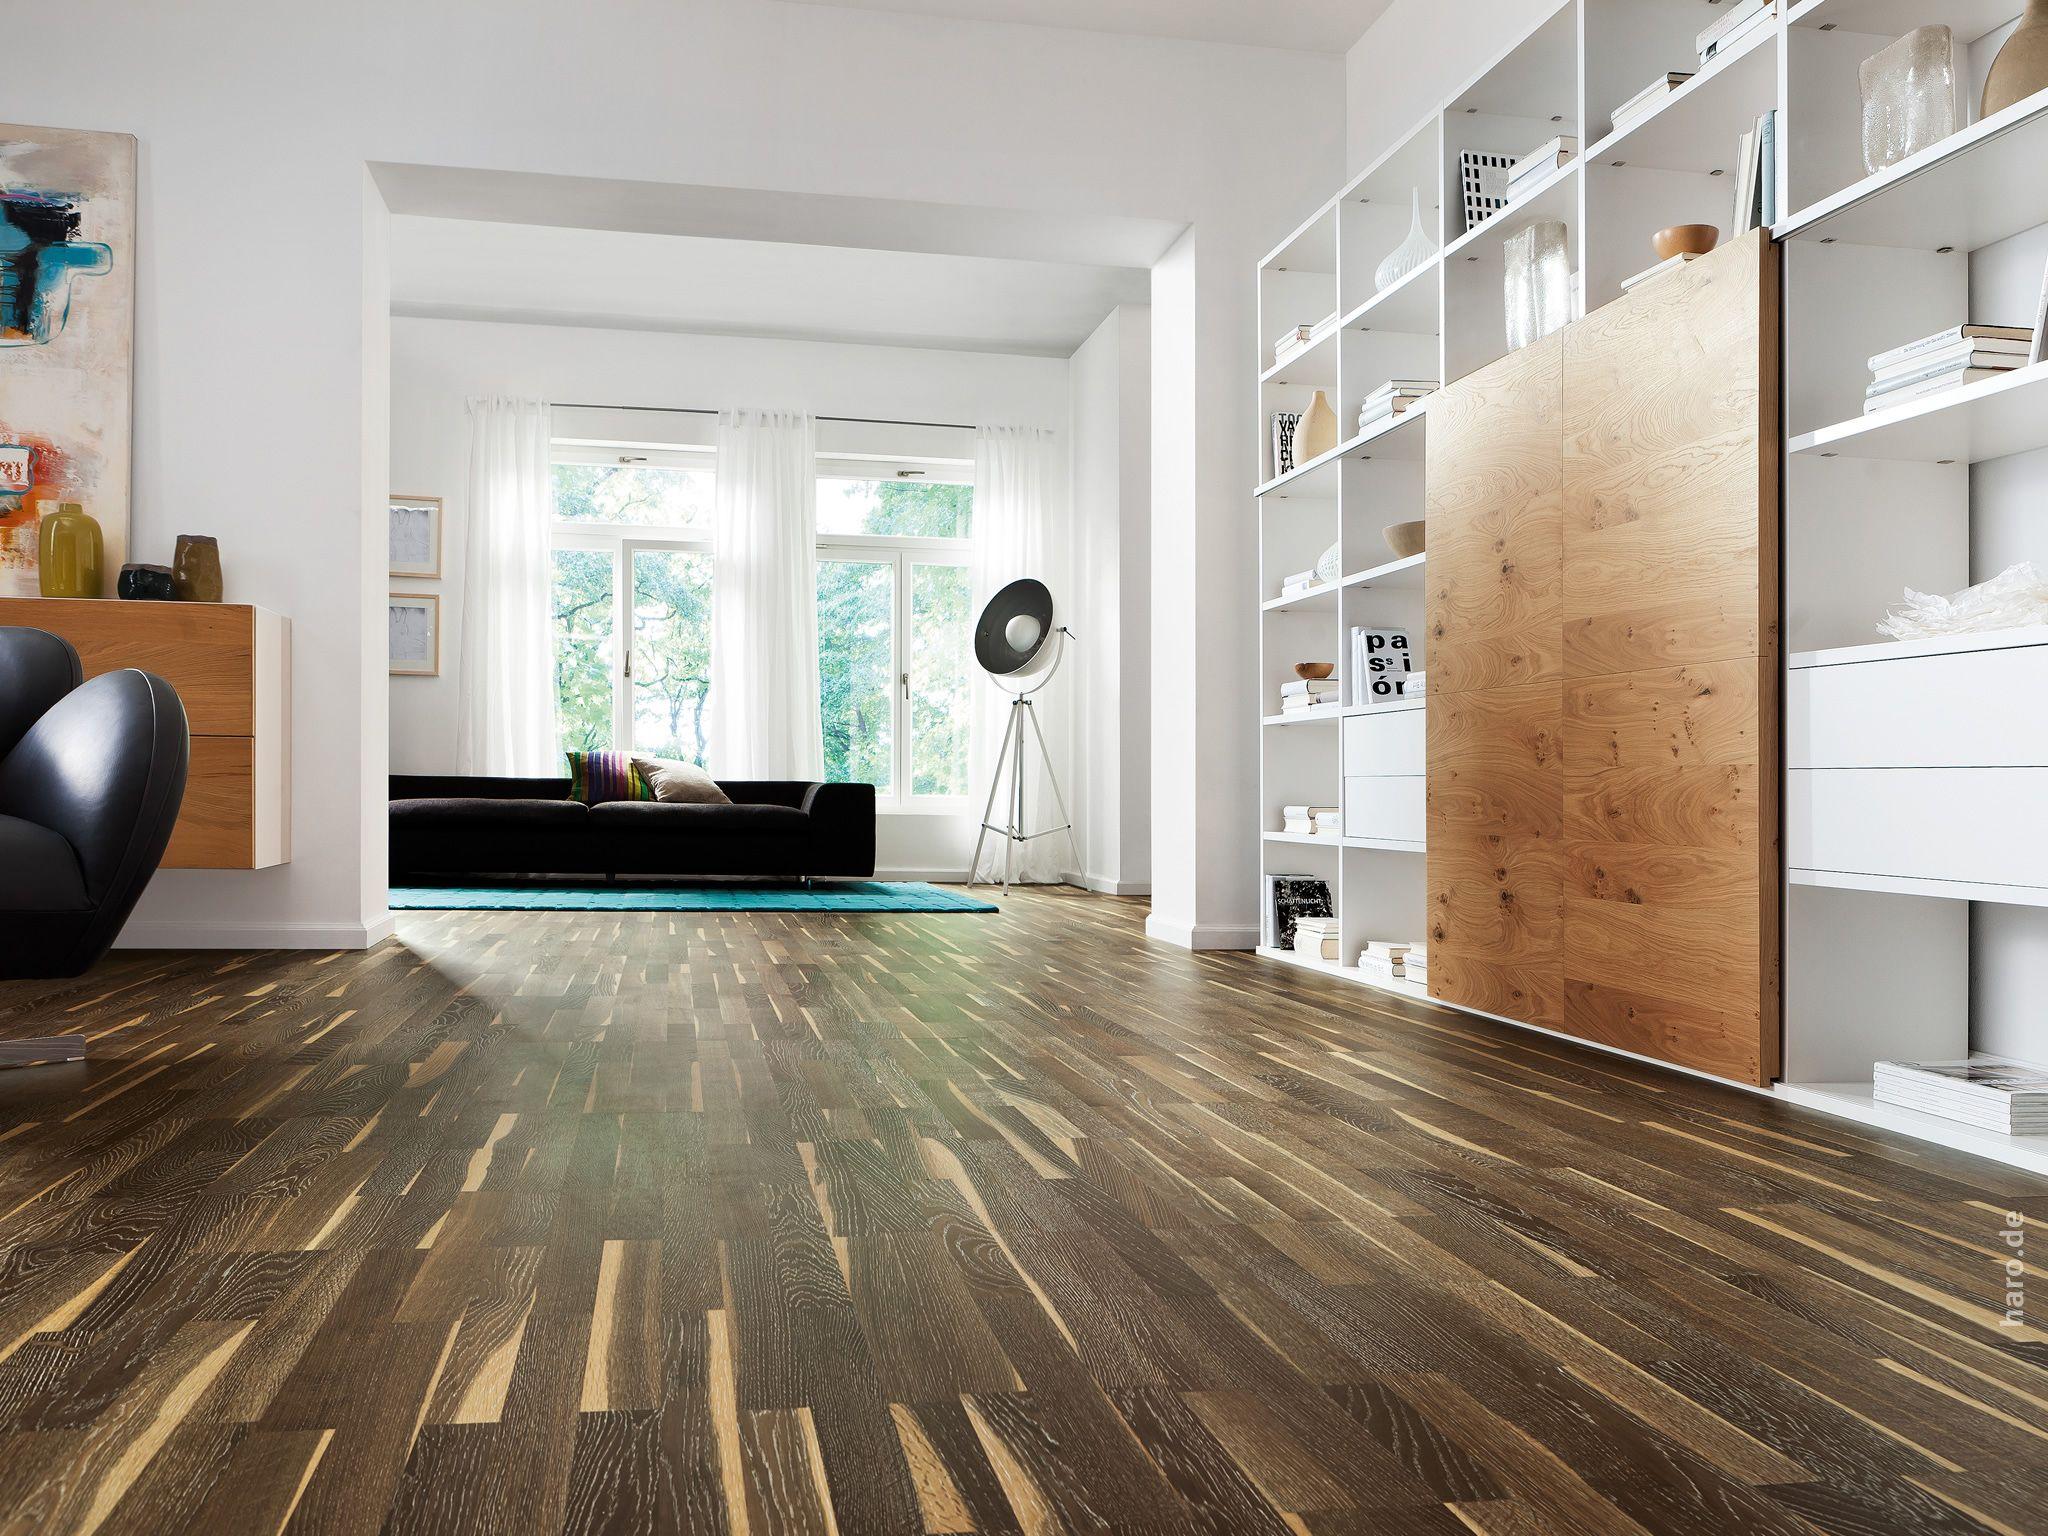 parkett verlegen flur fliesen oder laminat flur verlegen hexagon heizungsrohr verlegen. Black Bedroom Furniture Sets. Home Design Ideas